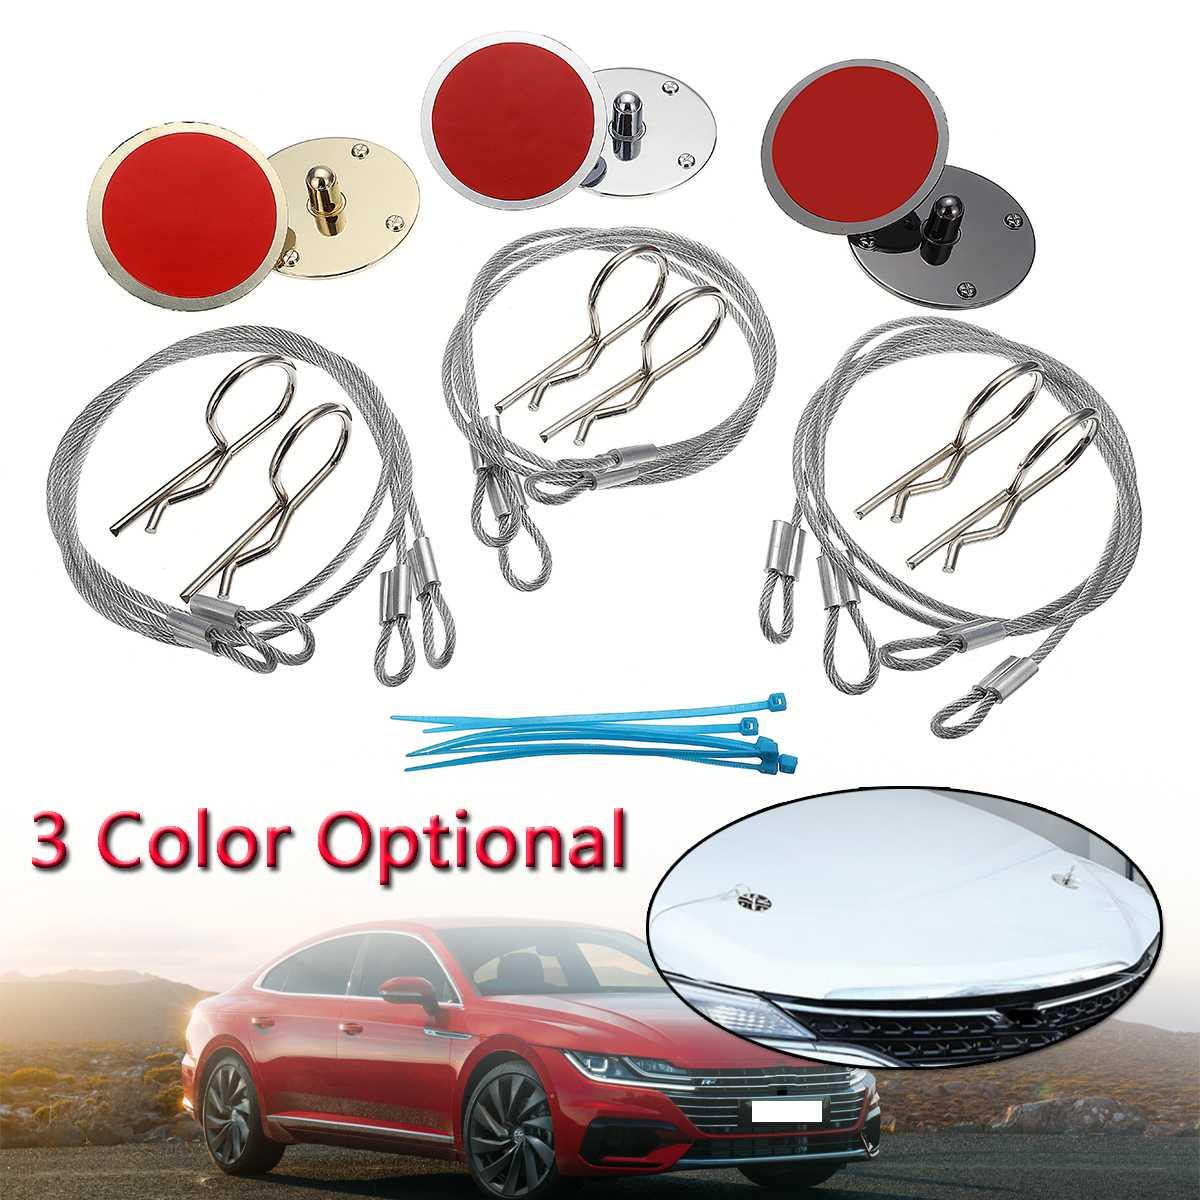 New 2pcs Universal Car Front Racing Bonnet Hood Pin Lock Appearance Kit CNC Billet Aluminum Titanium/Silver/Gold CUP561788